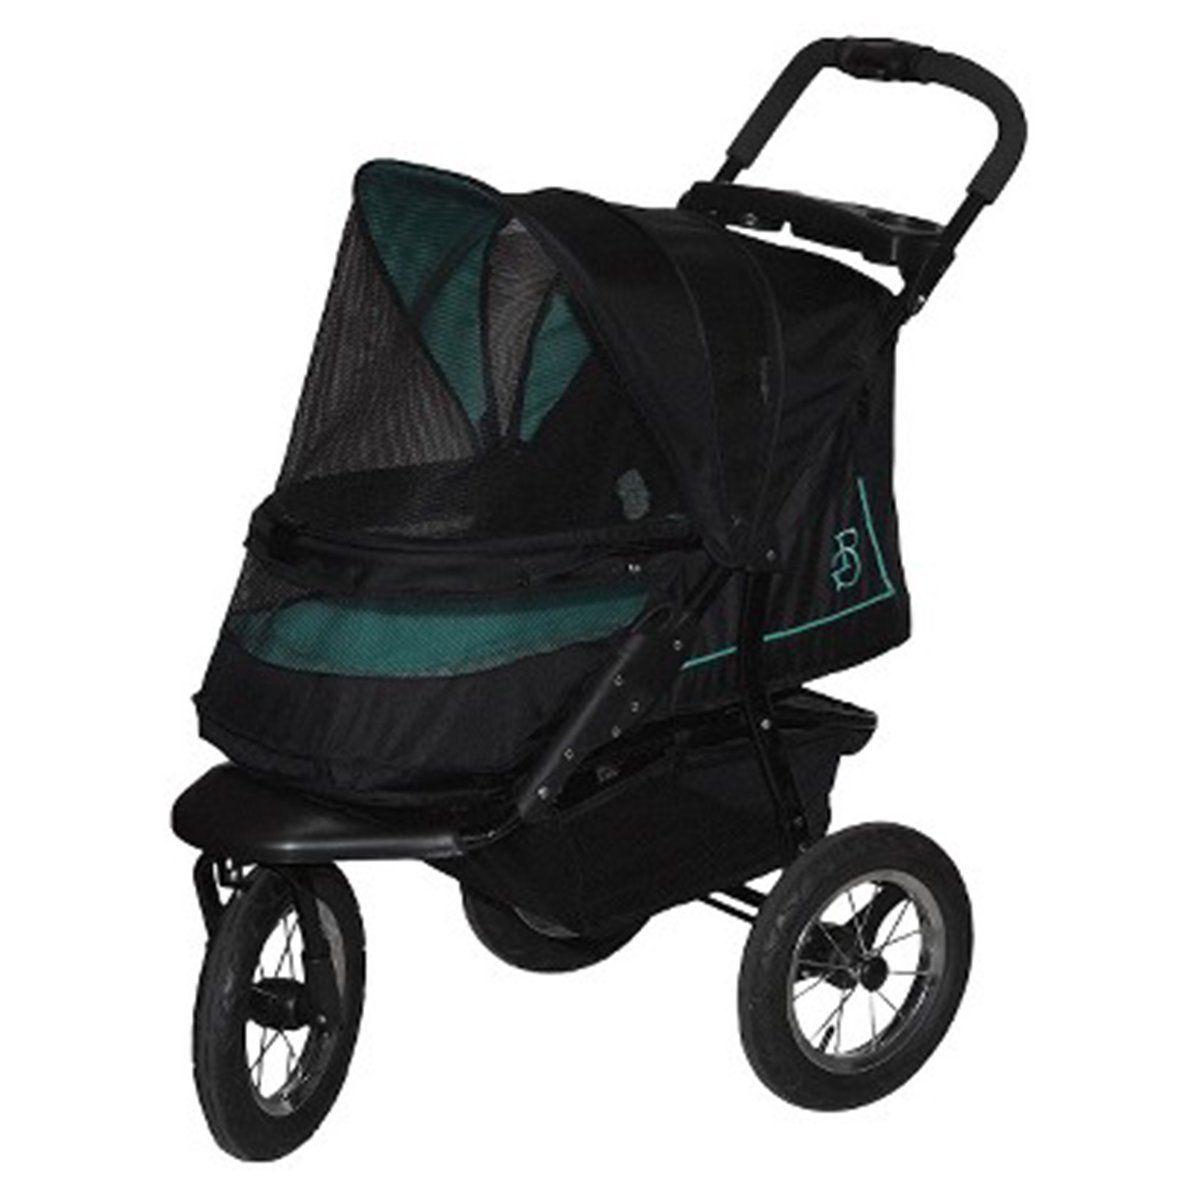 The green Pet Gear NV NoZip Pet Stroller > Additional